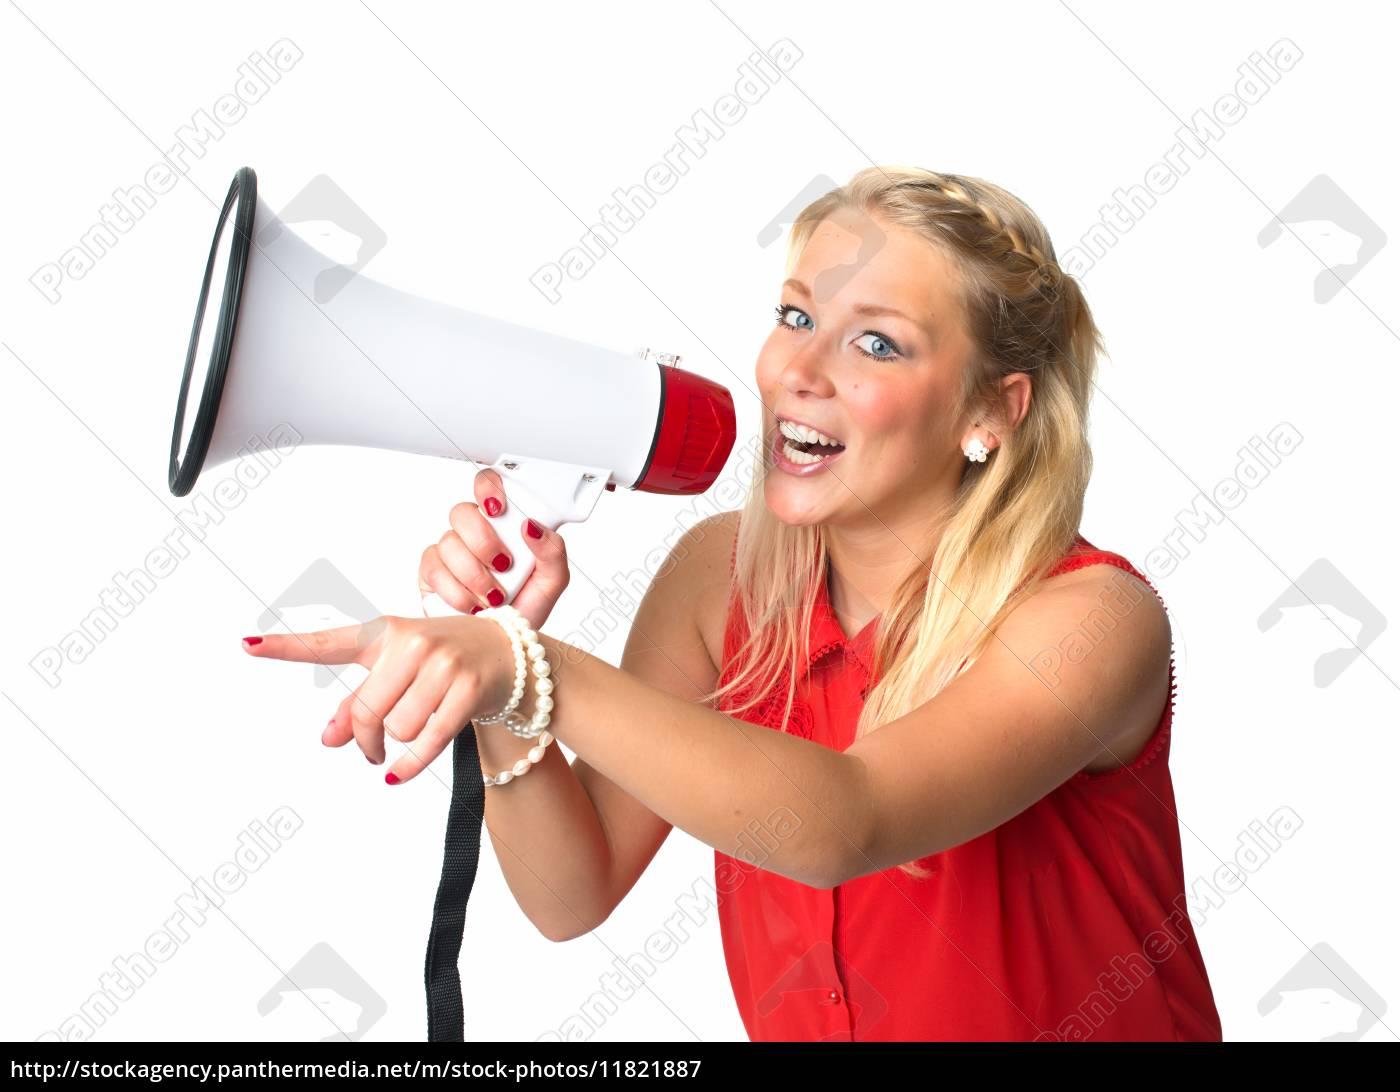 blonde, frau, mit, megafon - 11821887